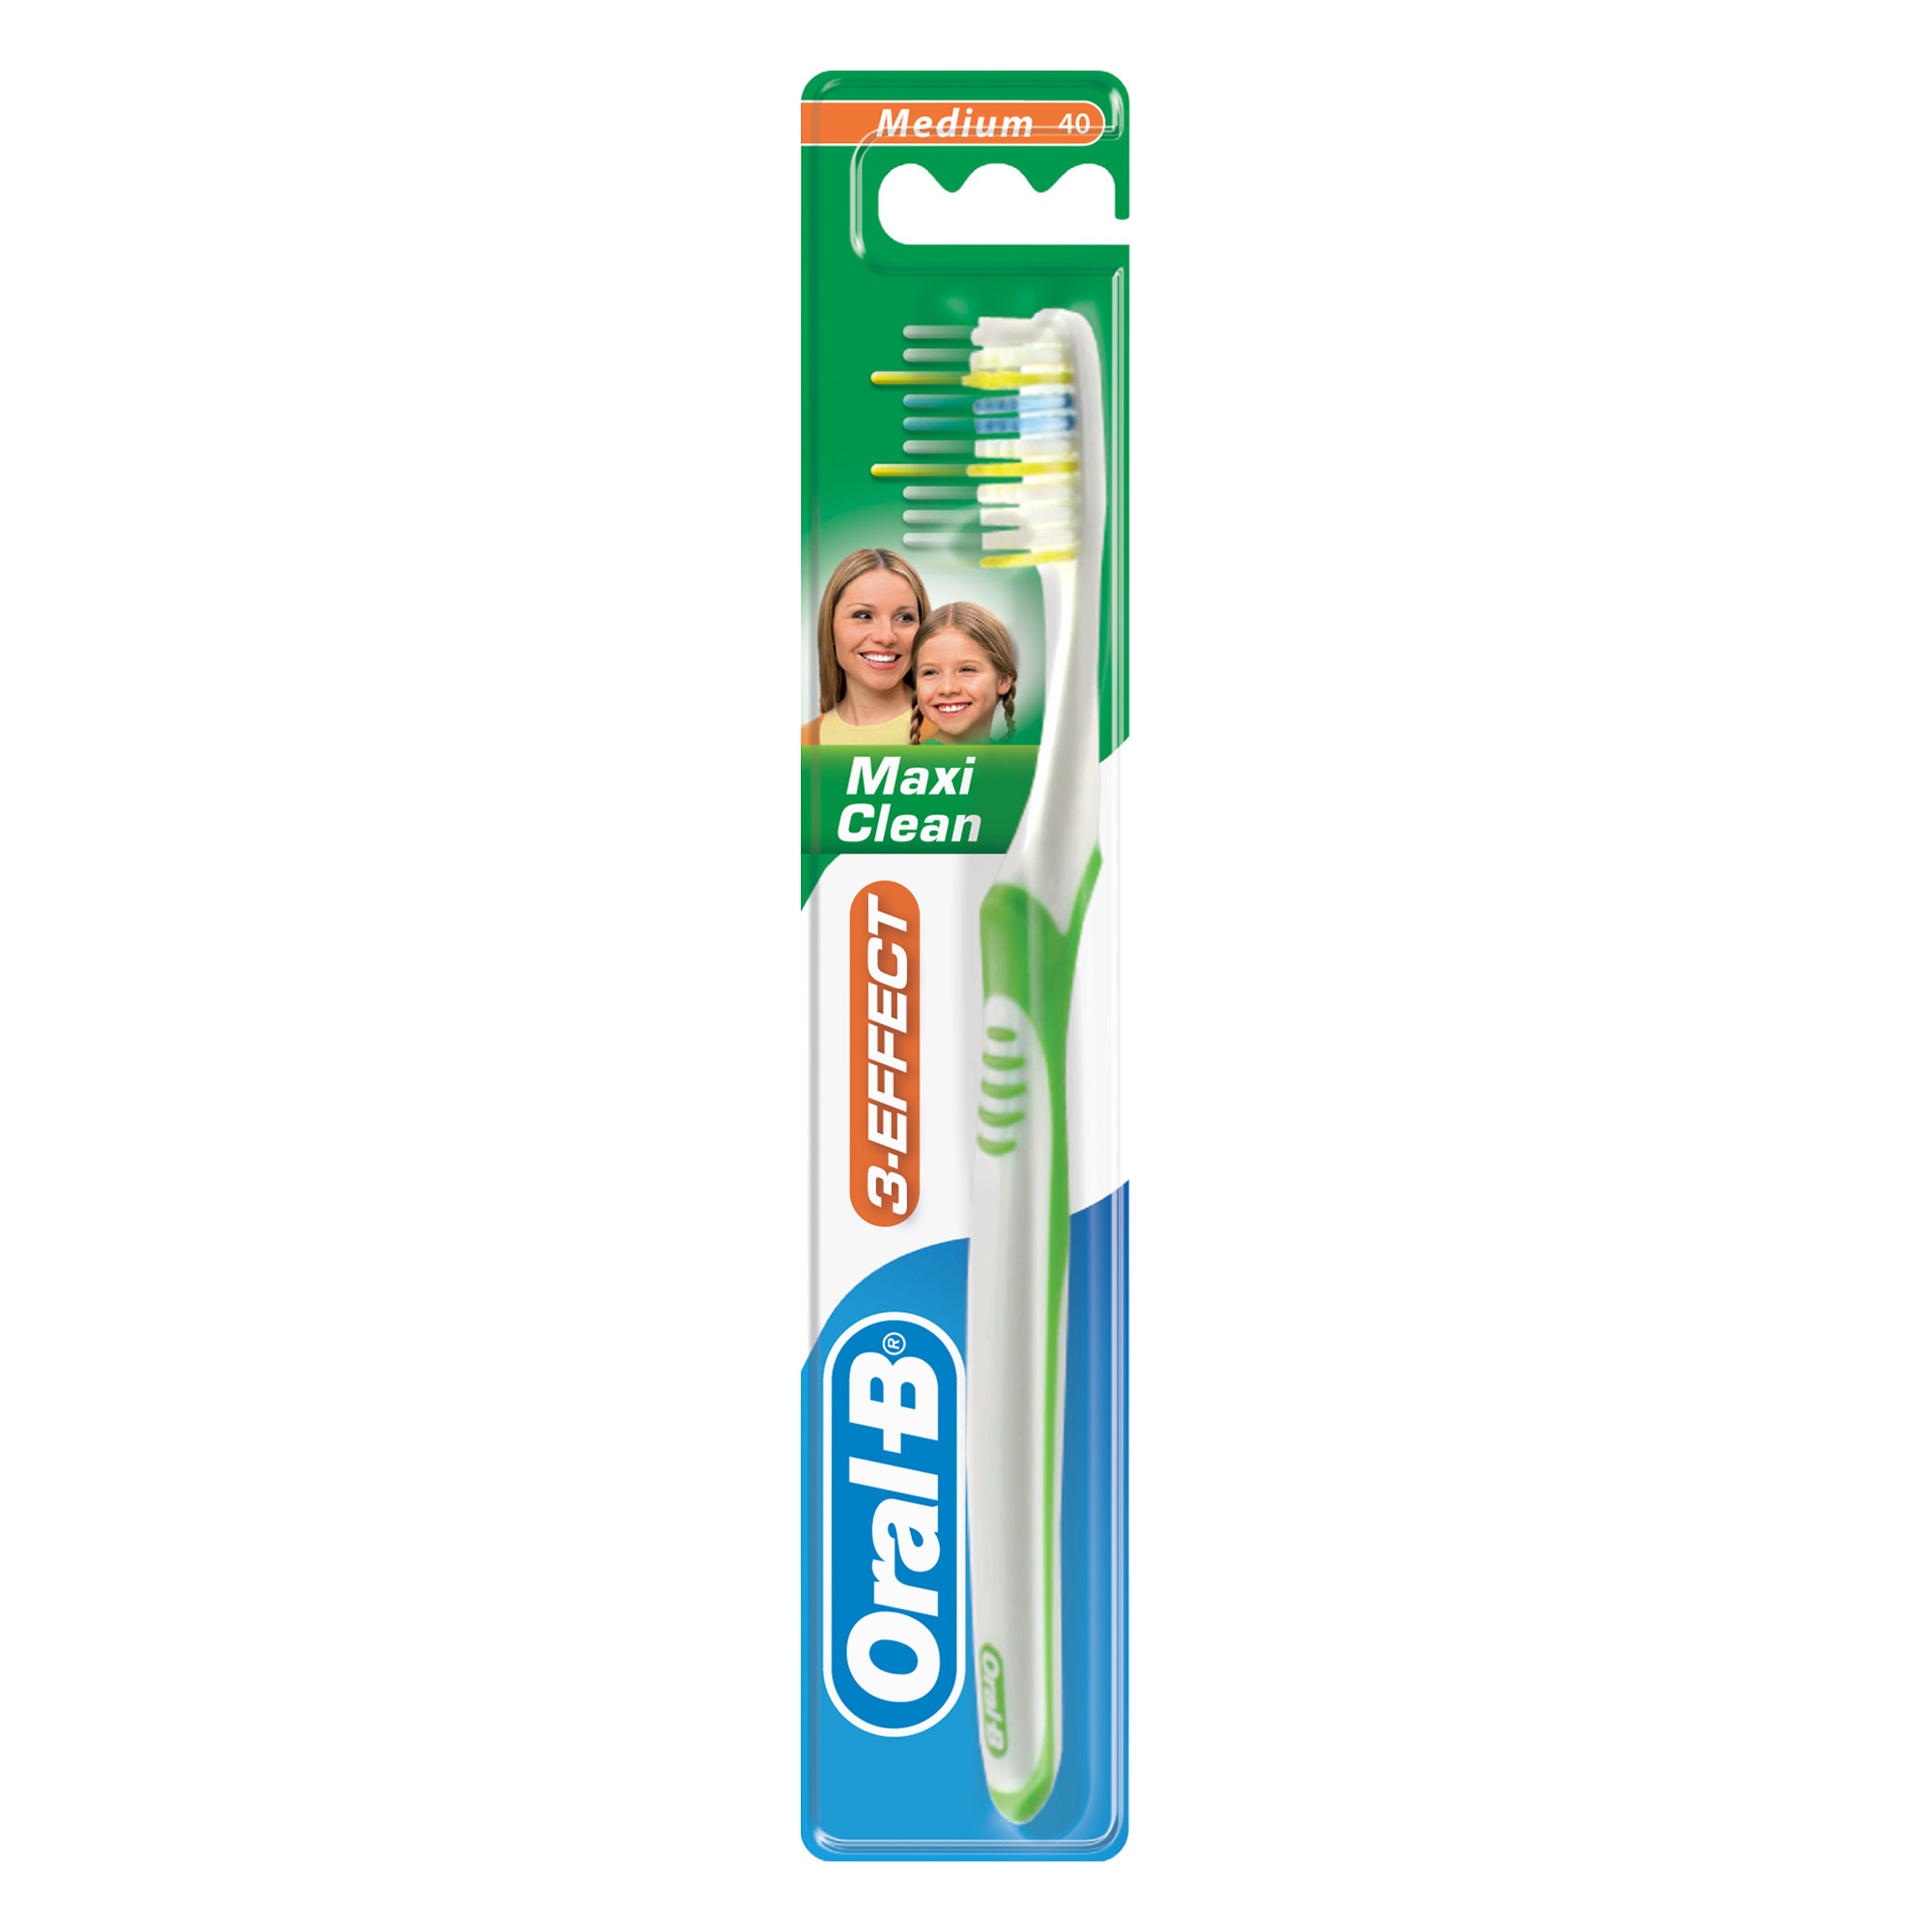 Зубная щетка Oral-B 3_Effect Maxi Clean Vision 40 средняя 1 шт